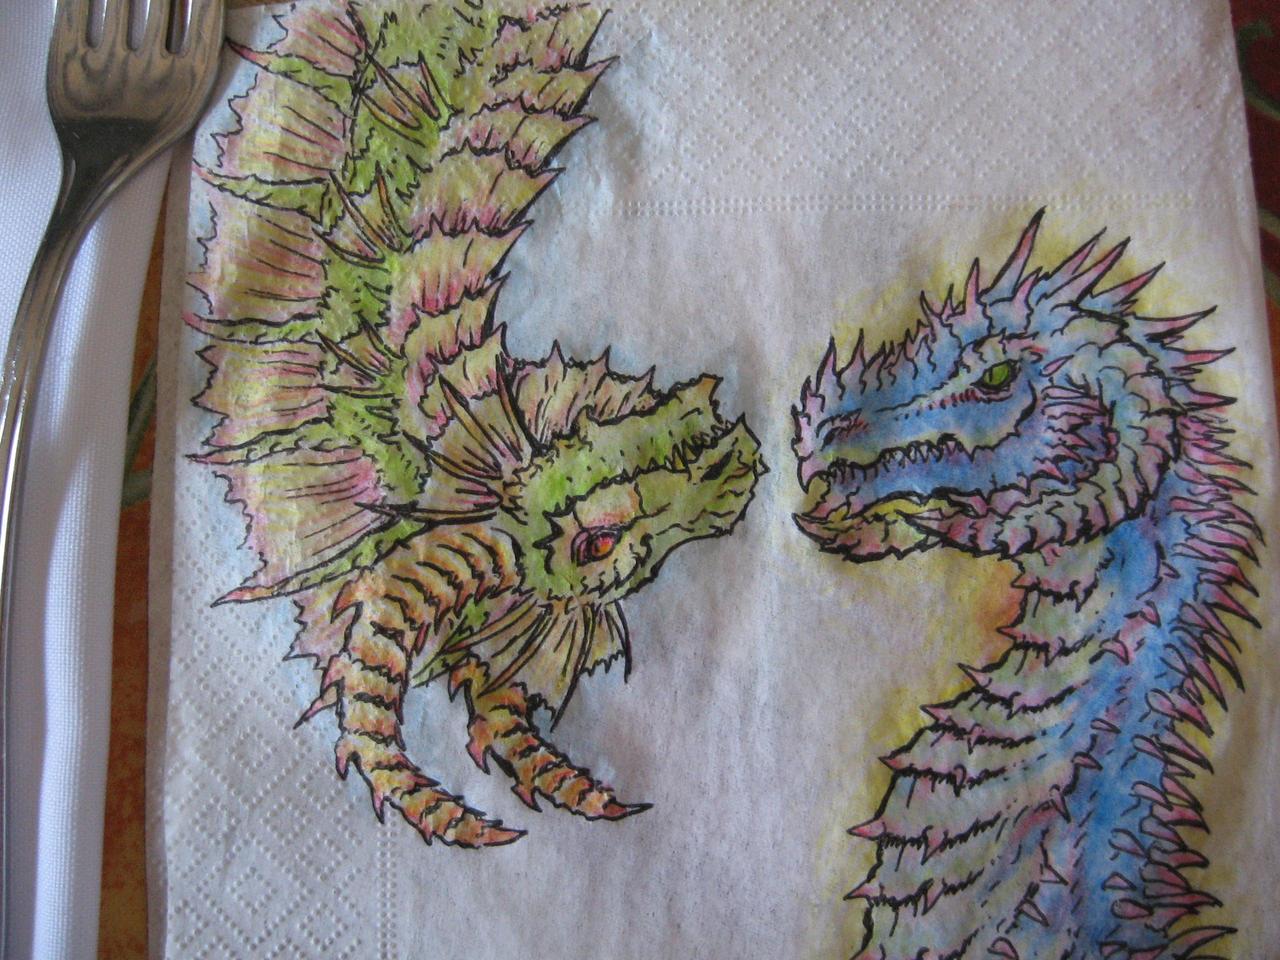 Napkin Dragons by CelebrenIthil